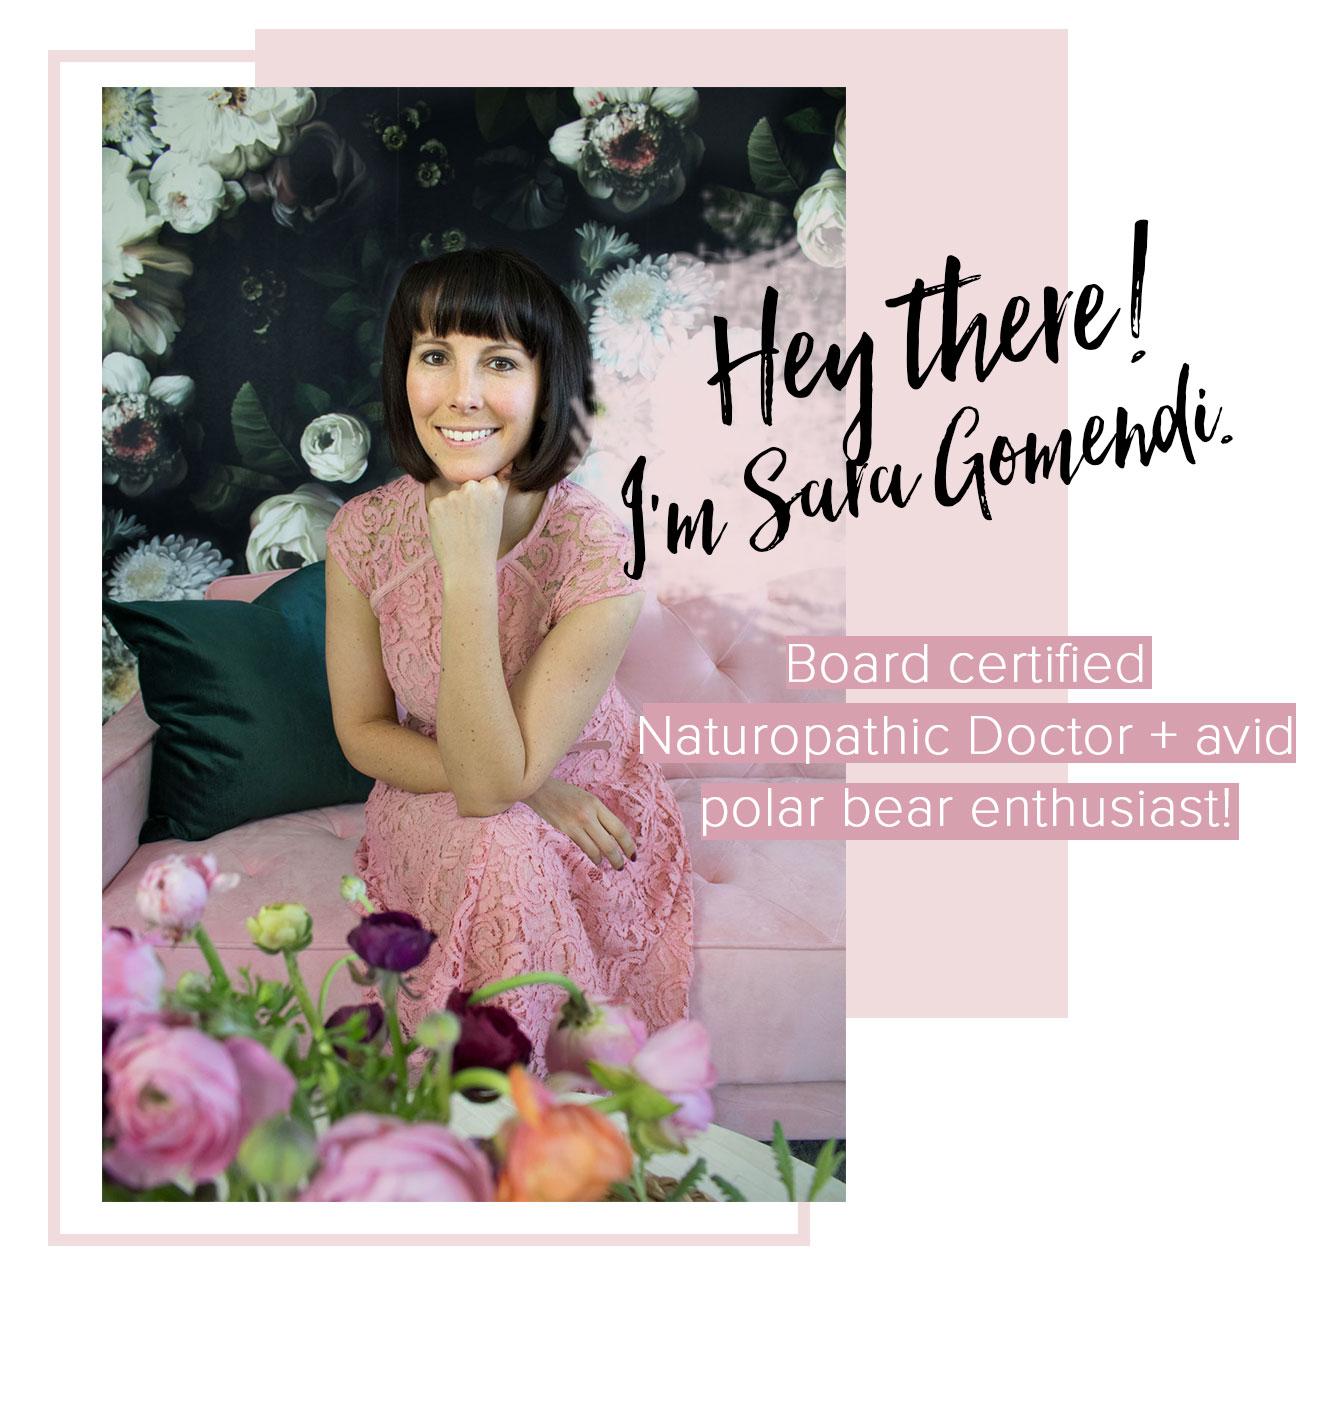 Dr. Sara Gomendi - Naturopathic Doctor Tulsa, OK